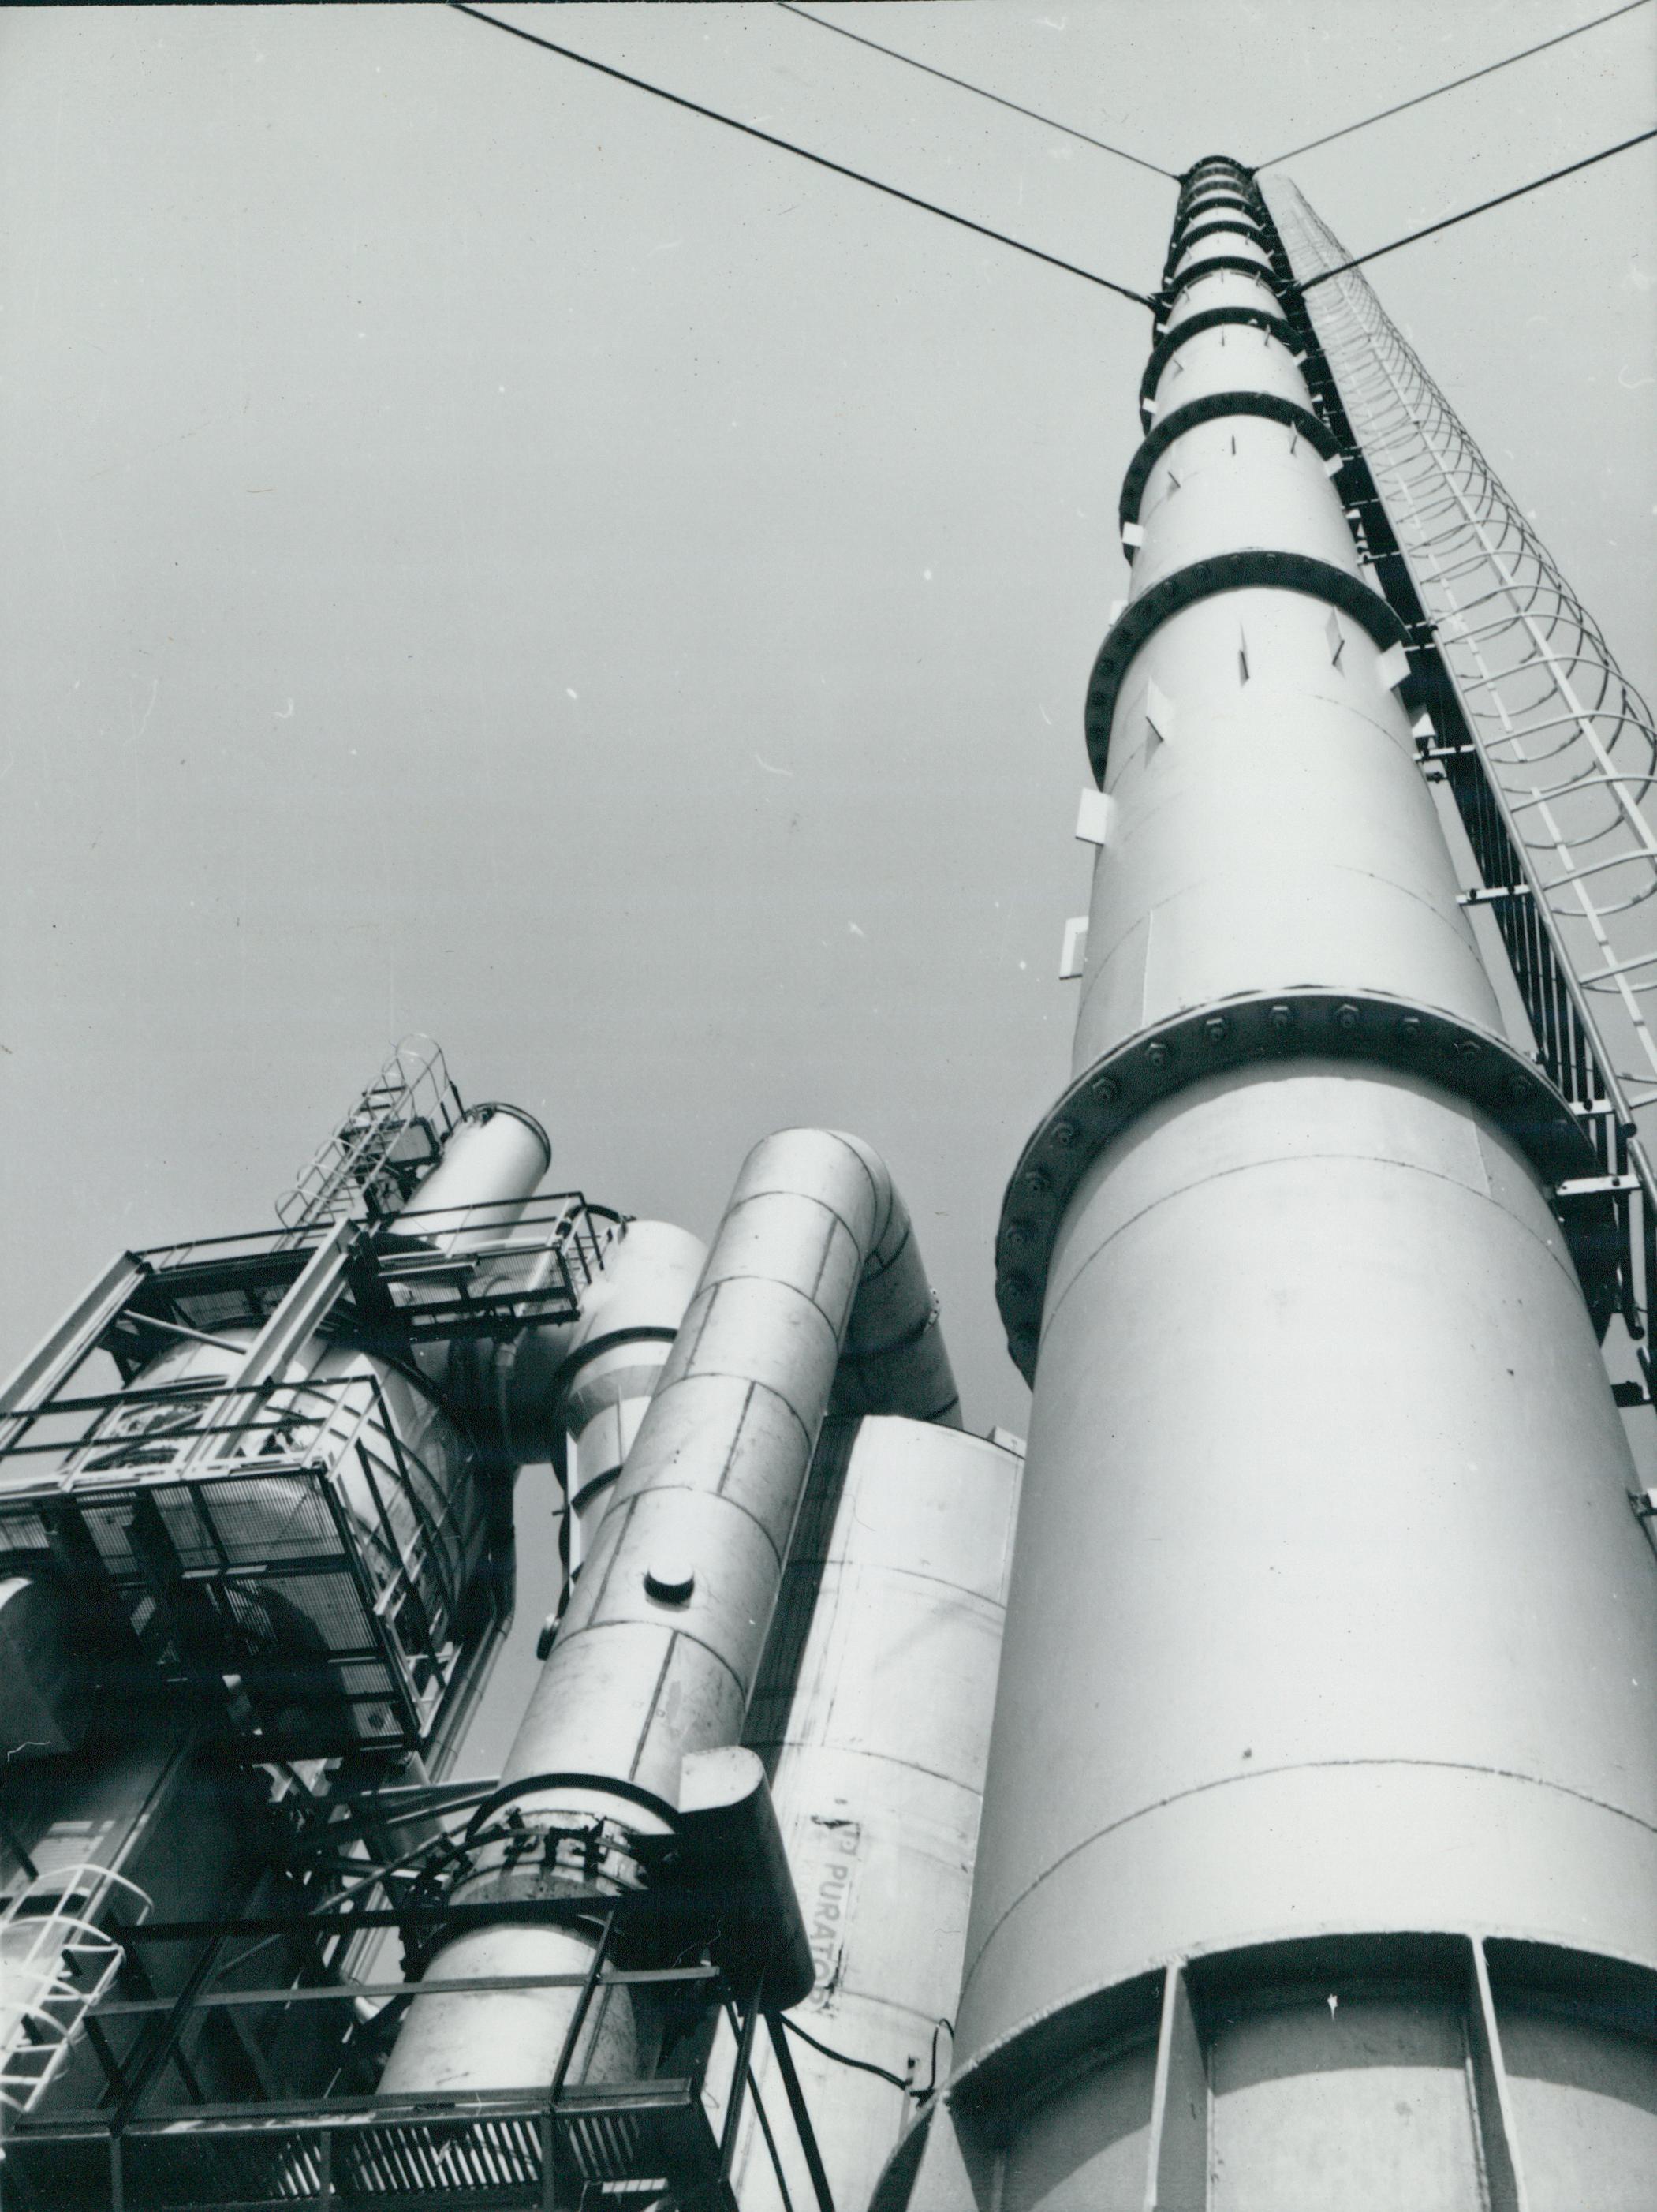 A Dunai Kőolajipari Vállalat hulladékégető berendezése